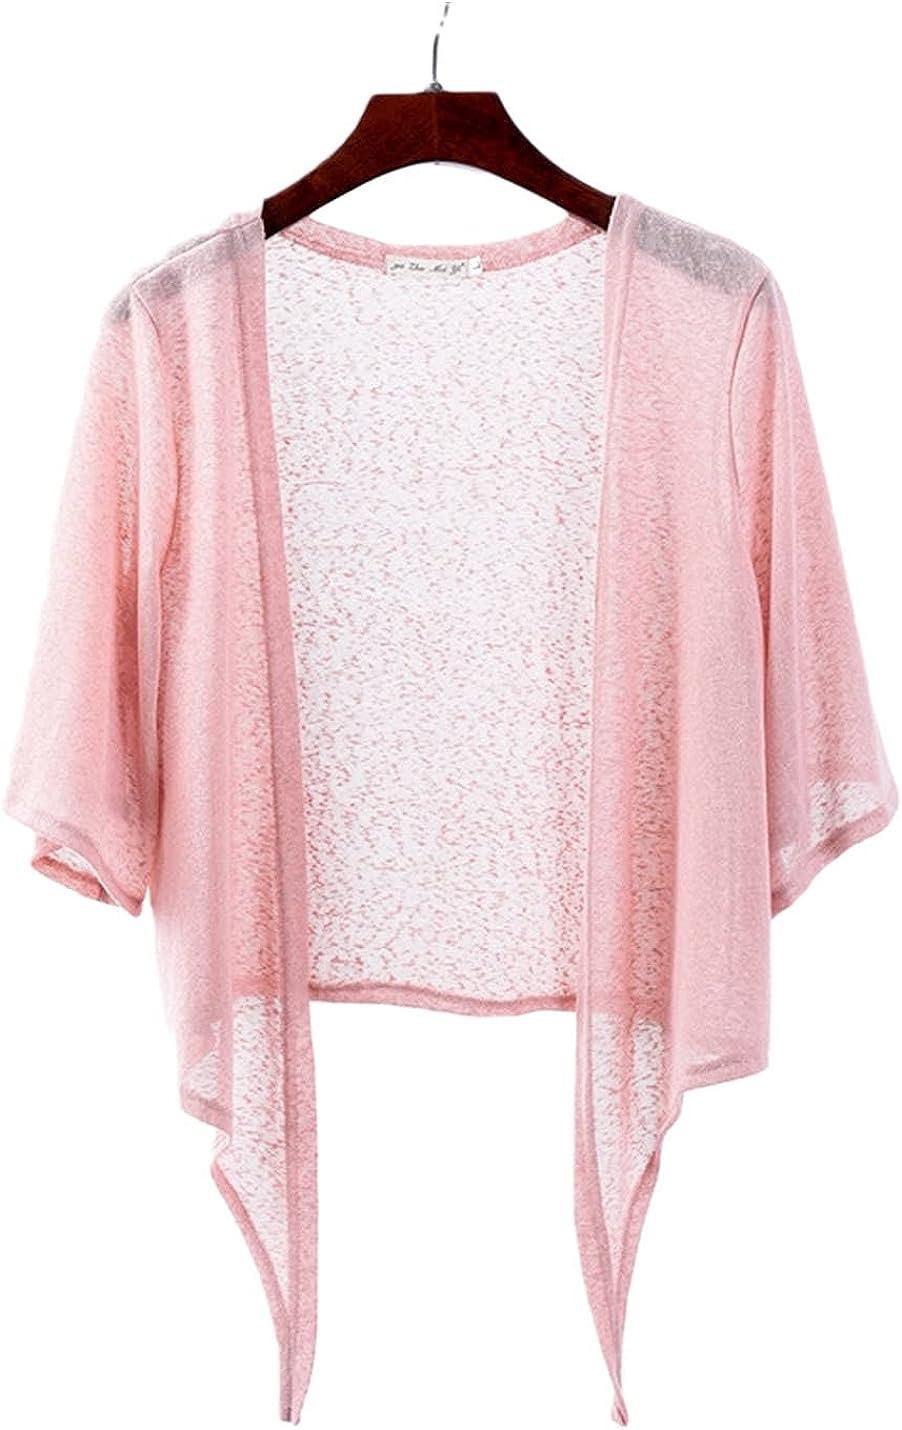 PEHMEA Women's Open Front Cardigan Casual Half Flare Sleeve Tie Front Bolero Shrug(Pink,x-Large)